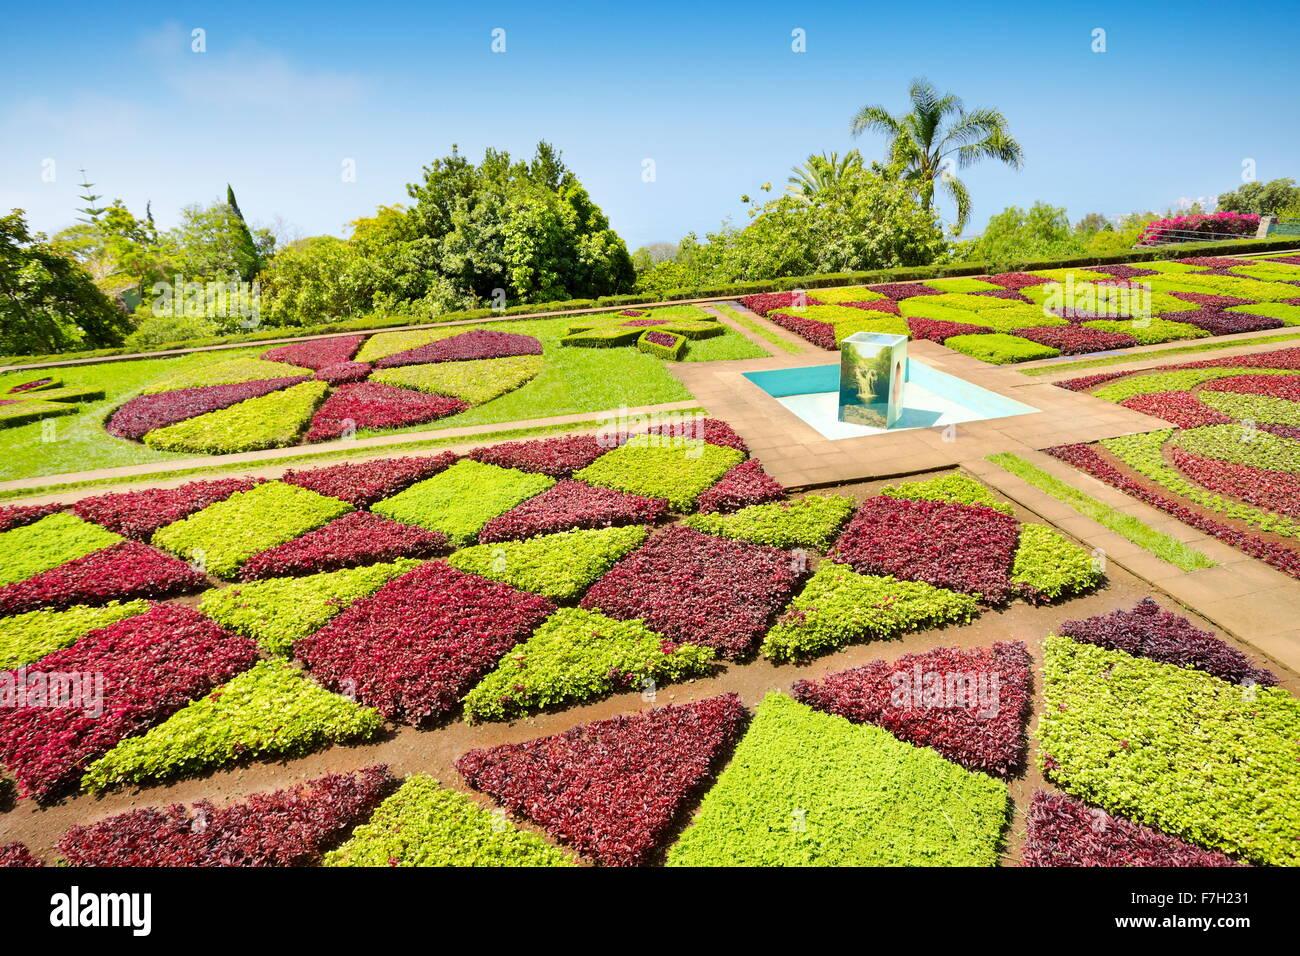 Die Madeira Botanischer Garten - Funchal, Madeira Insel, Portugal Stockbild